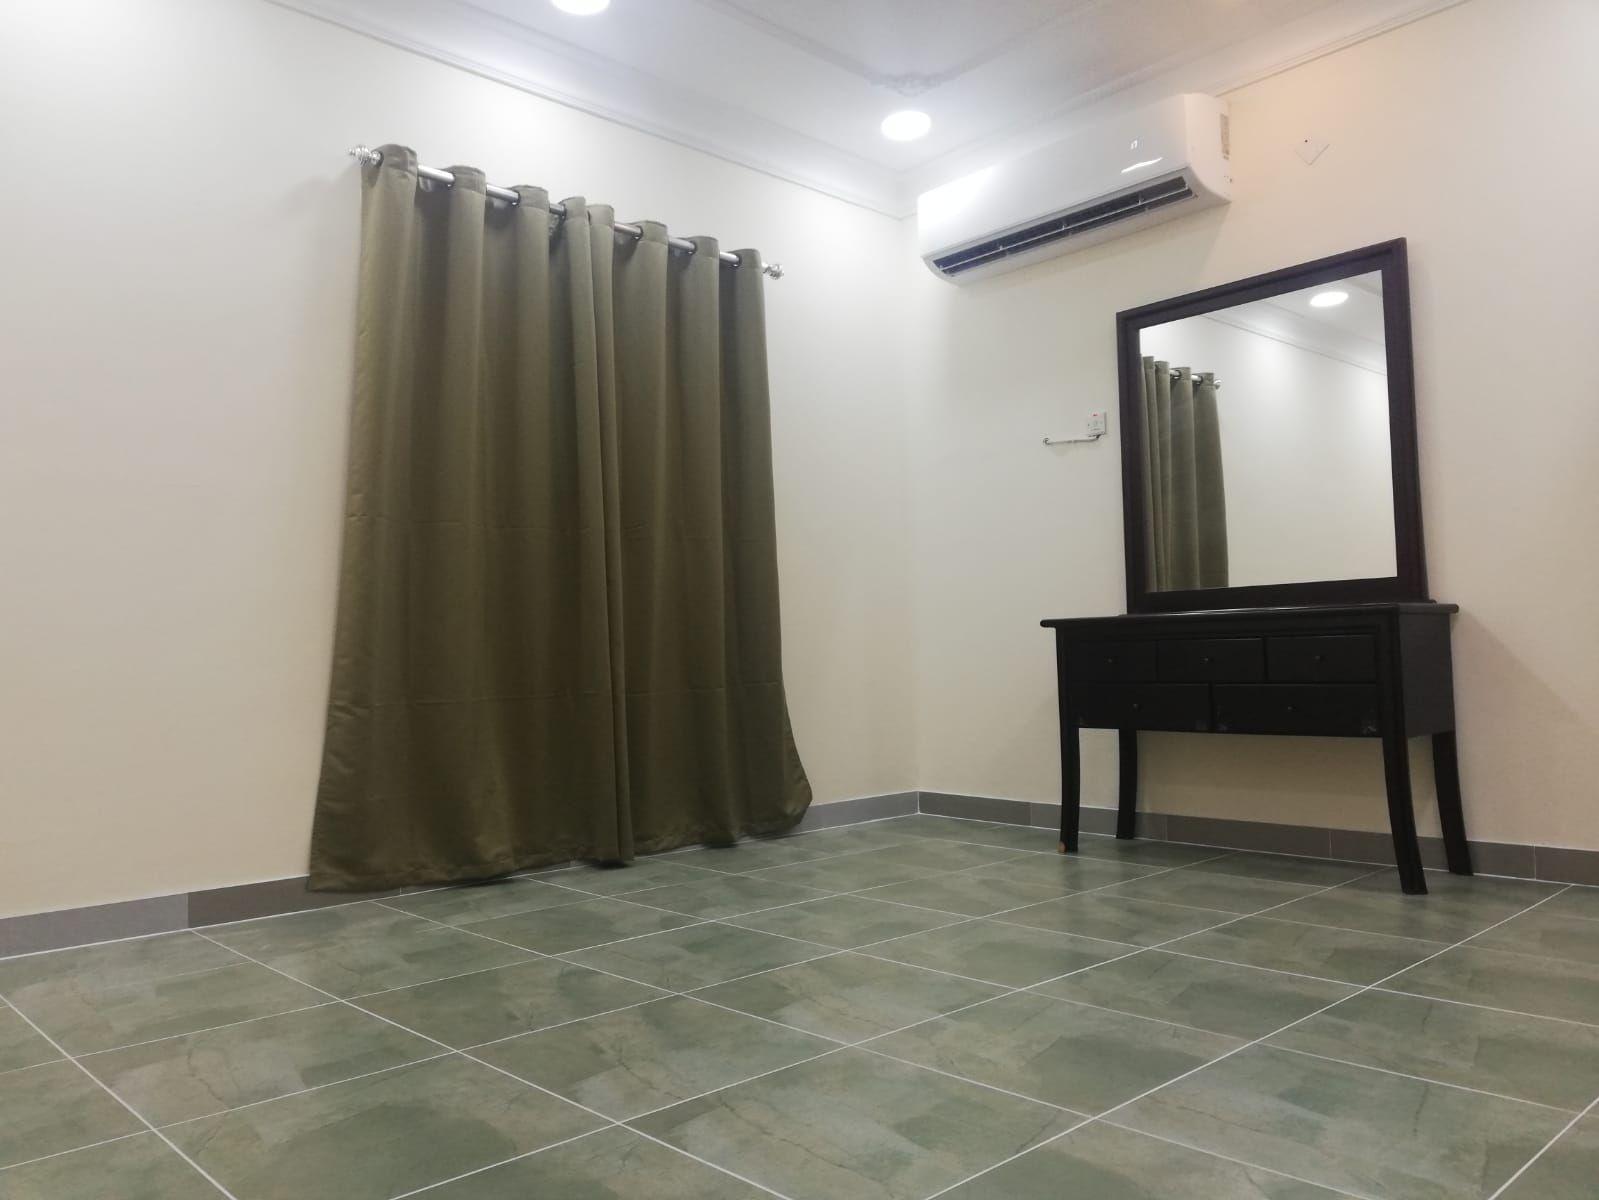 Studio flat for rent in zing area